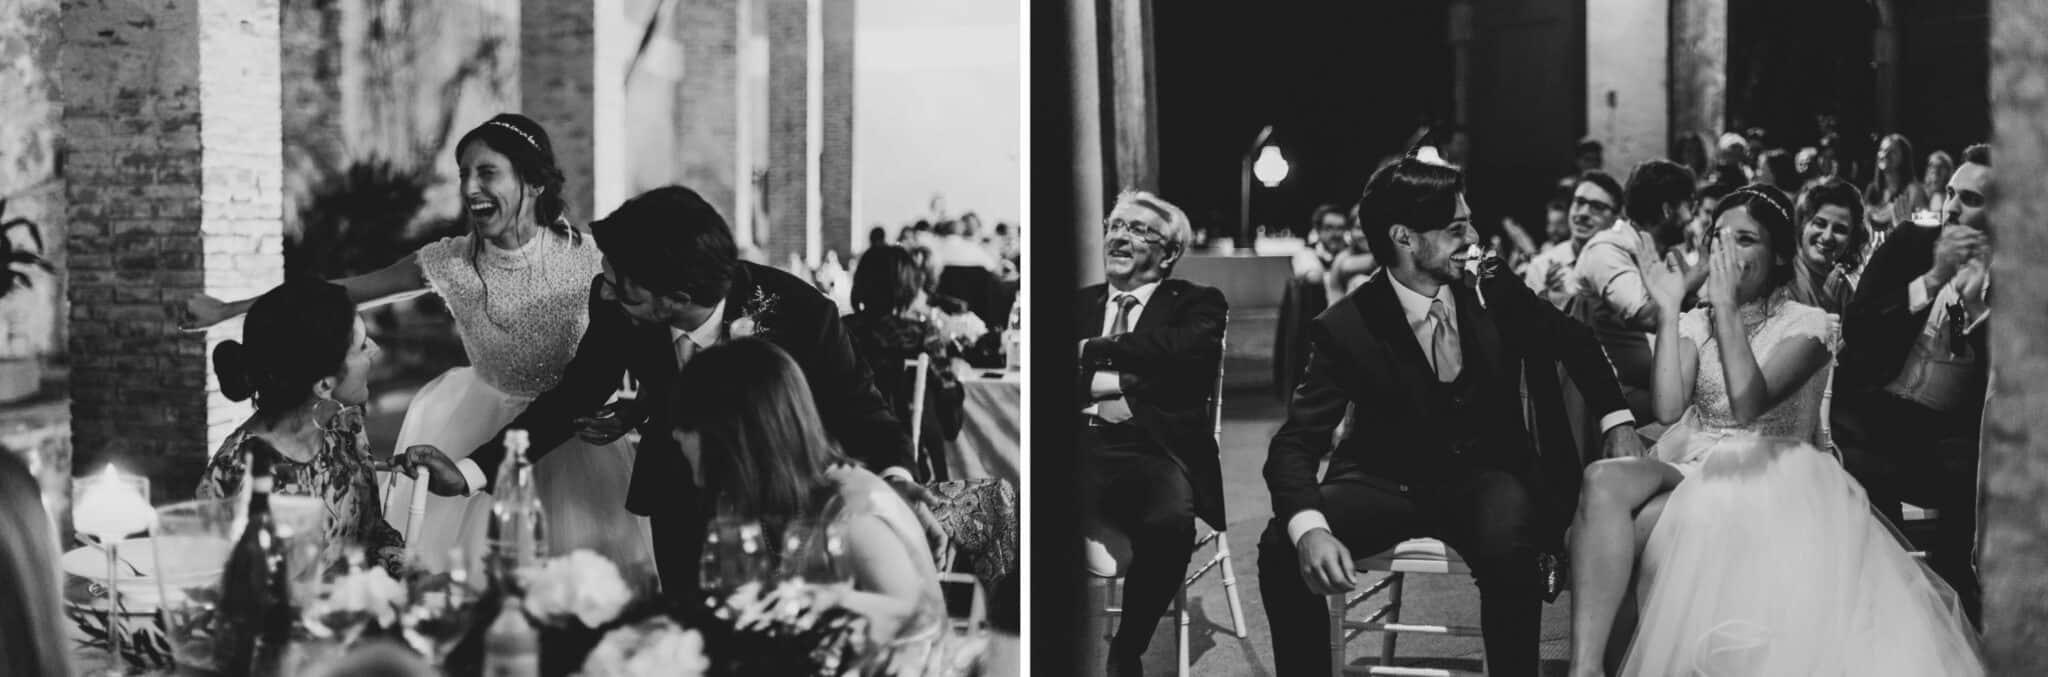 Moments during a wedding in Villa Grabau